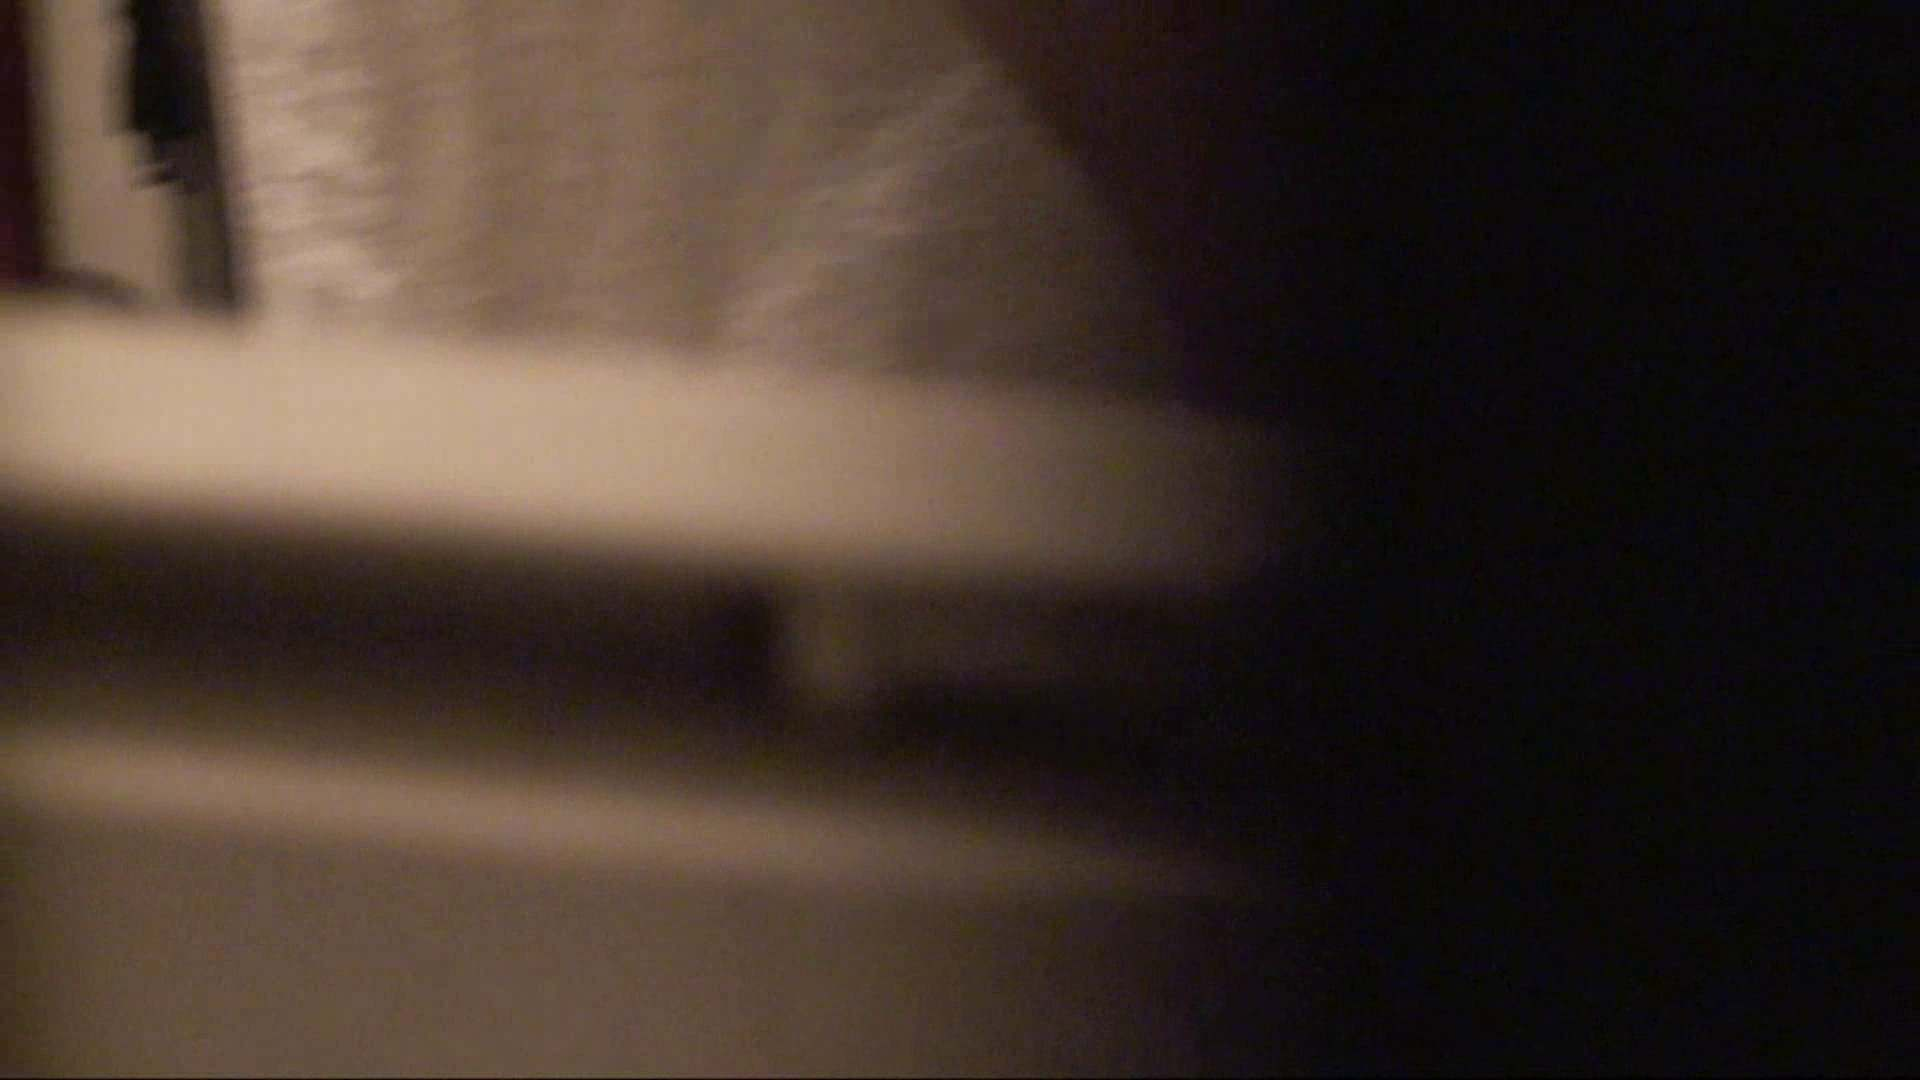 vol.02超可愛すぎる彼女の裸体をハイビジョンで!至近距離での眺め最高! 美人の裸体 AV無料動画キャプチャ 75枚 12